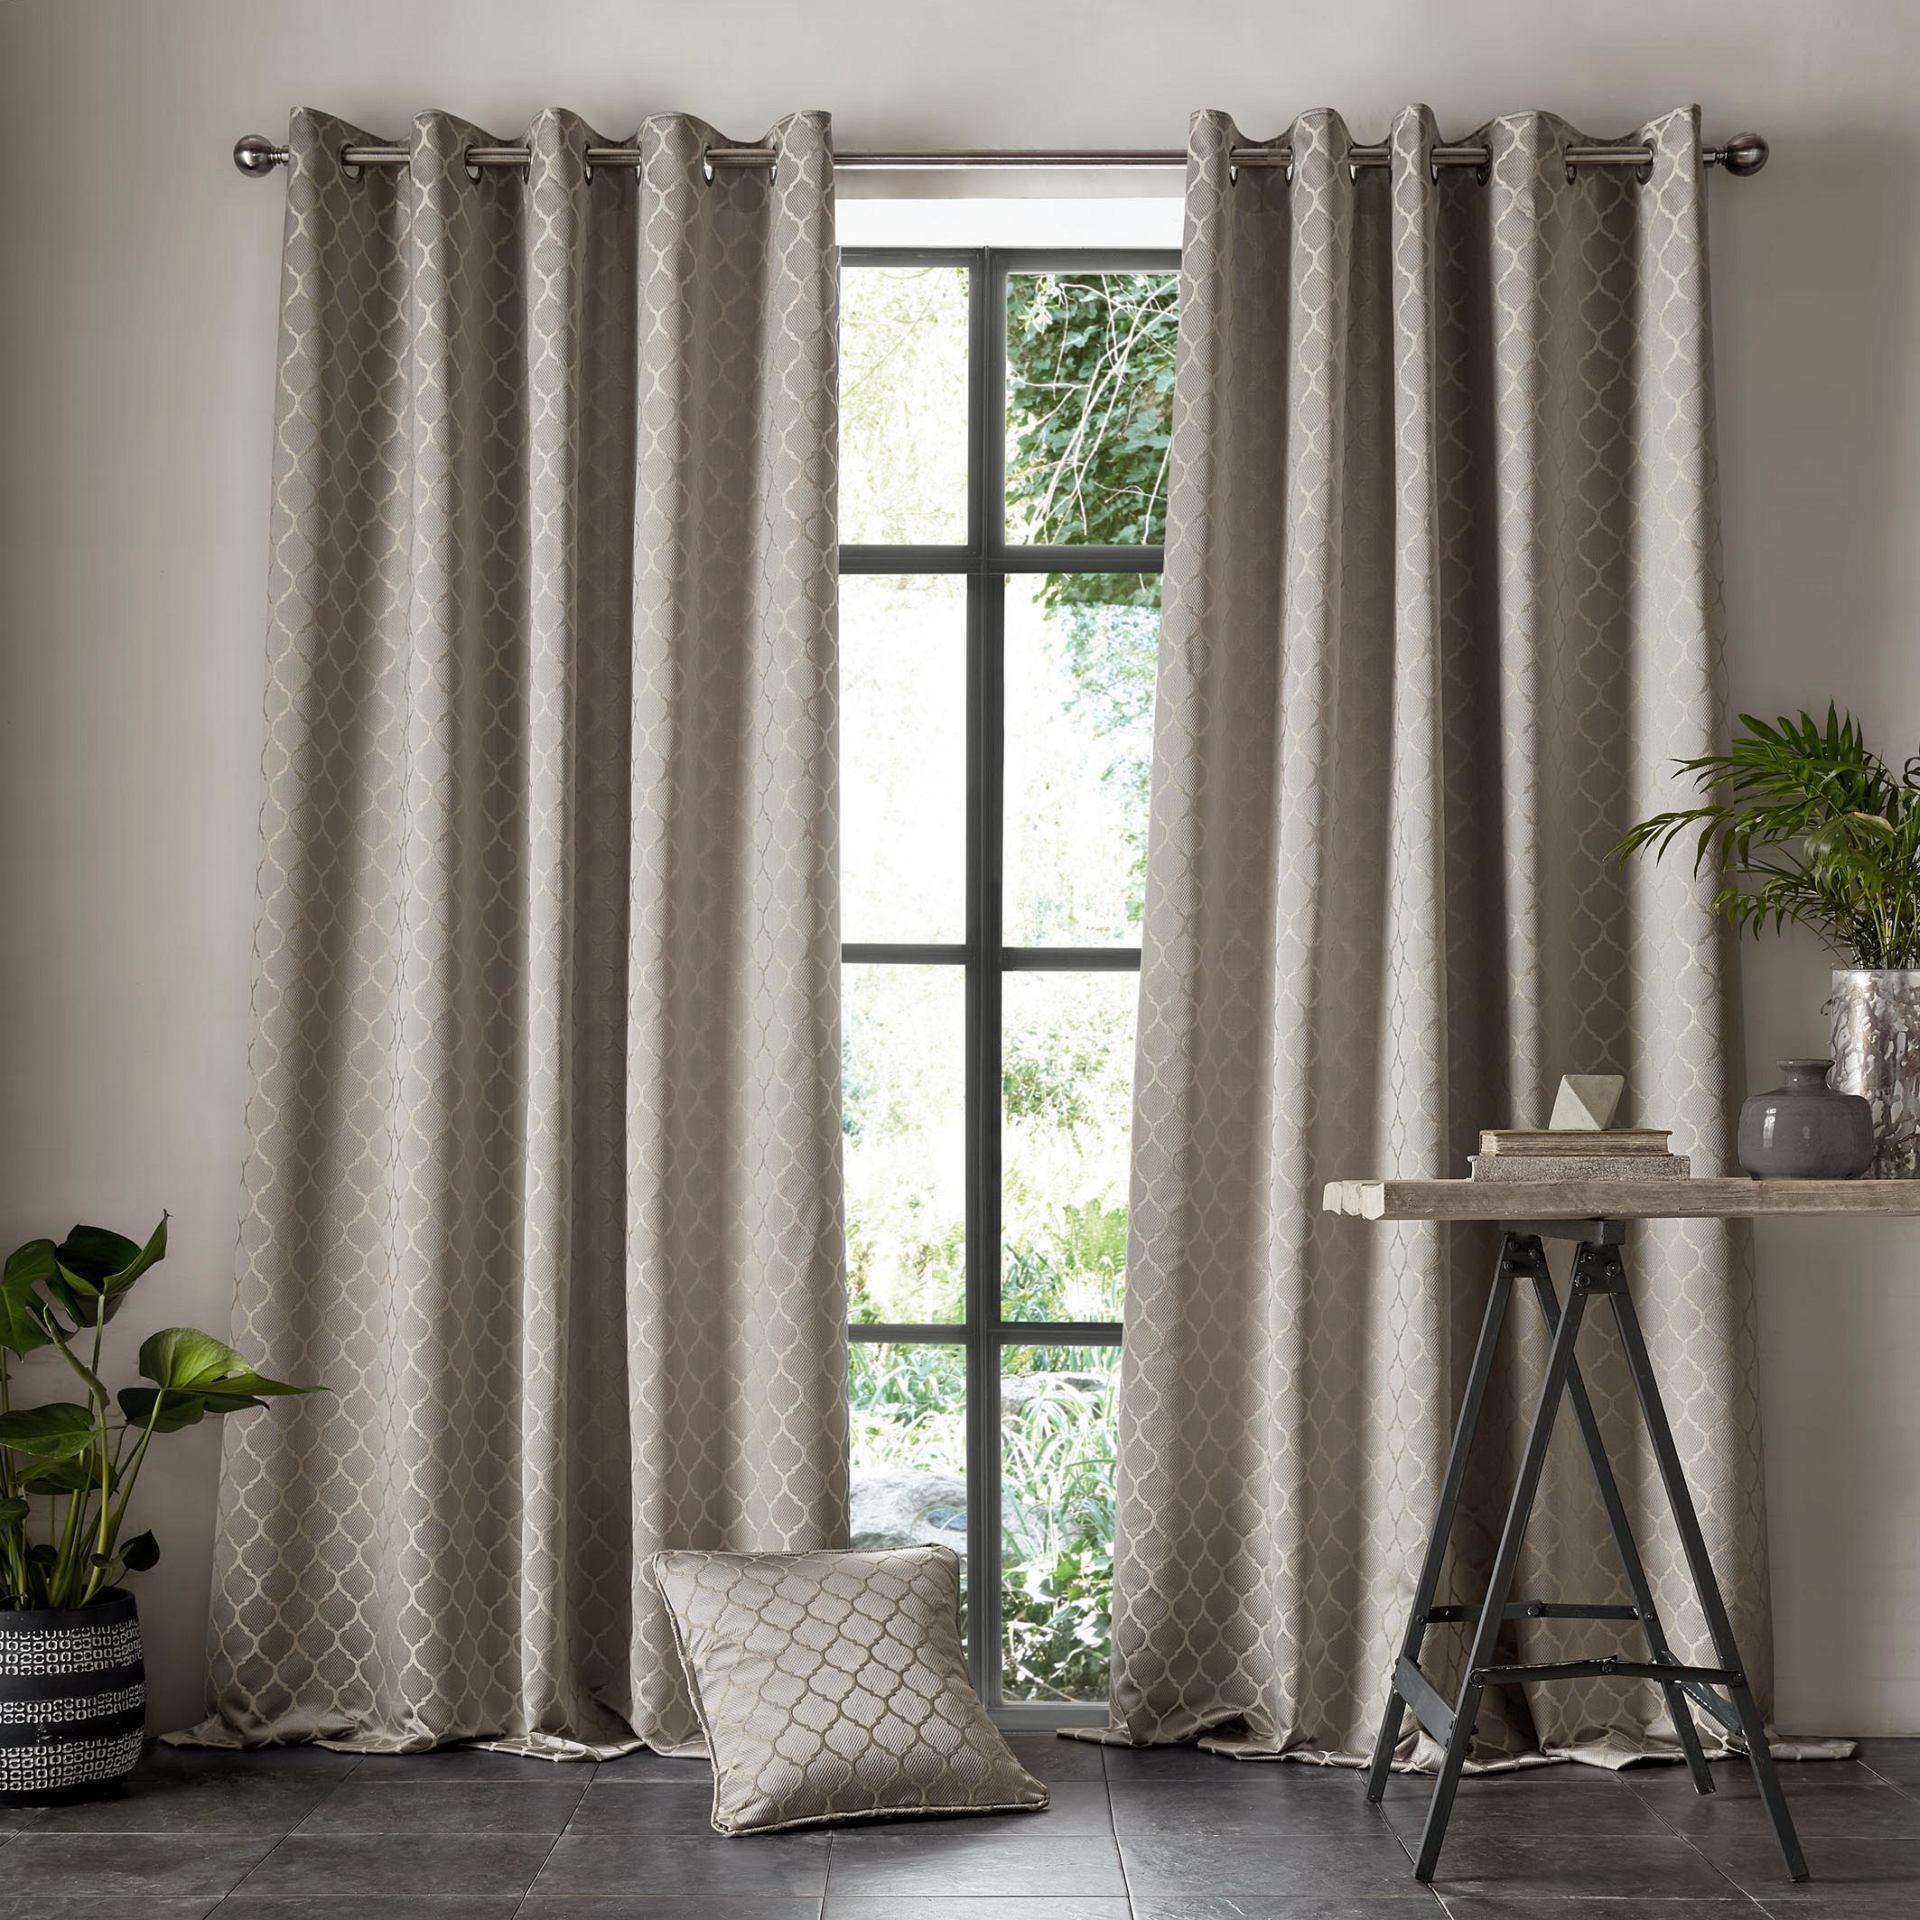 Village-fabrics-Curtains-Aldbury-Pewter